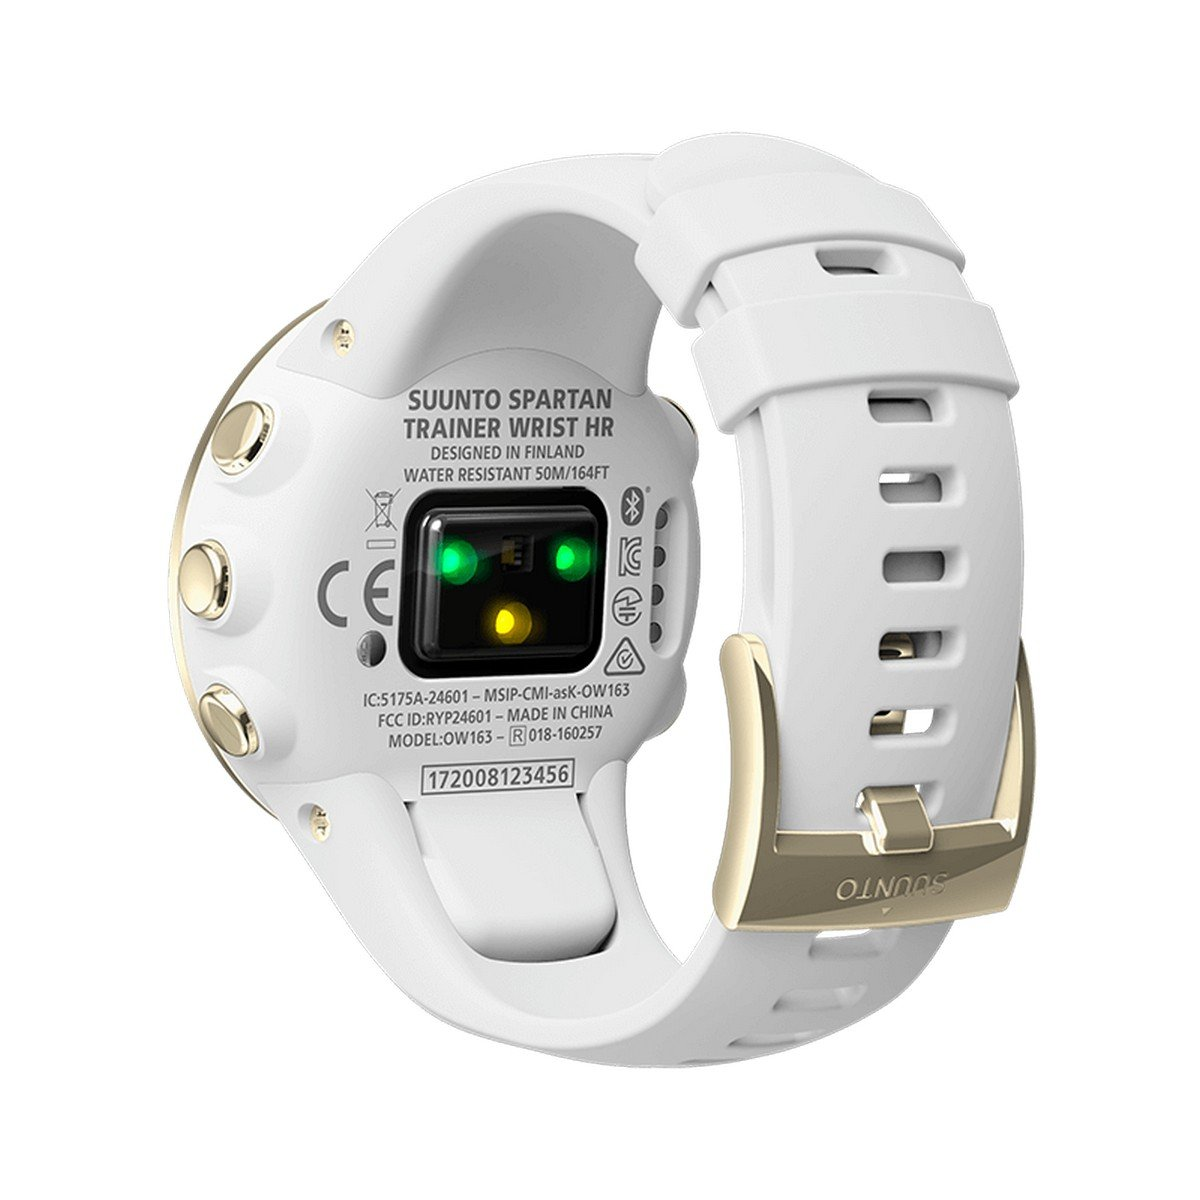 Suunto Spartan Trainer Wrist HR Multisport GPS Watch (Gold) by Suunto (Image #3)